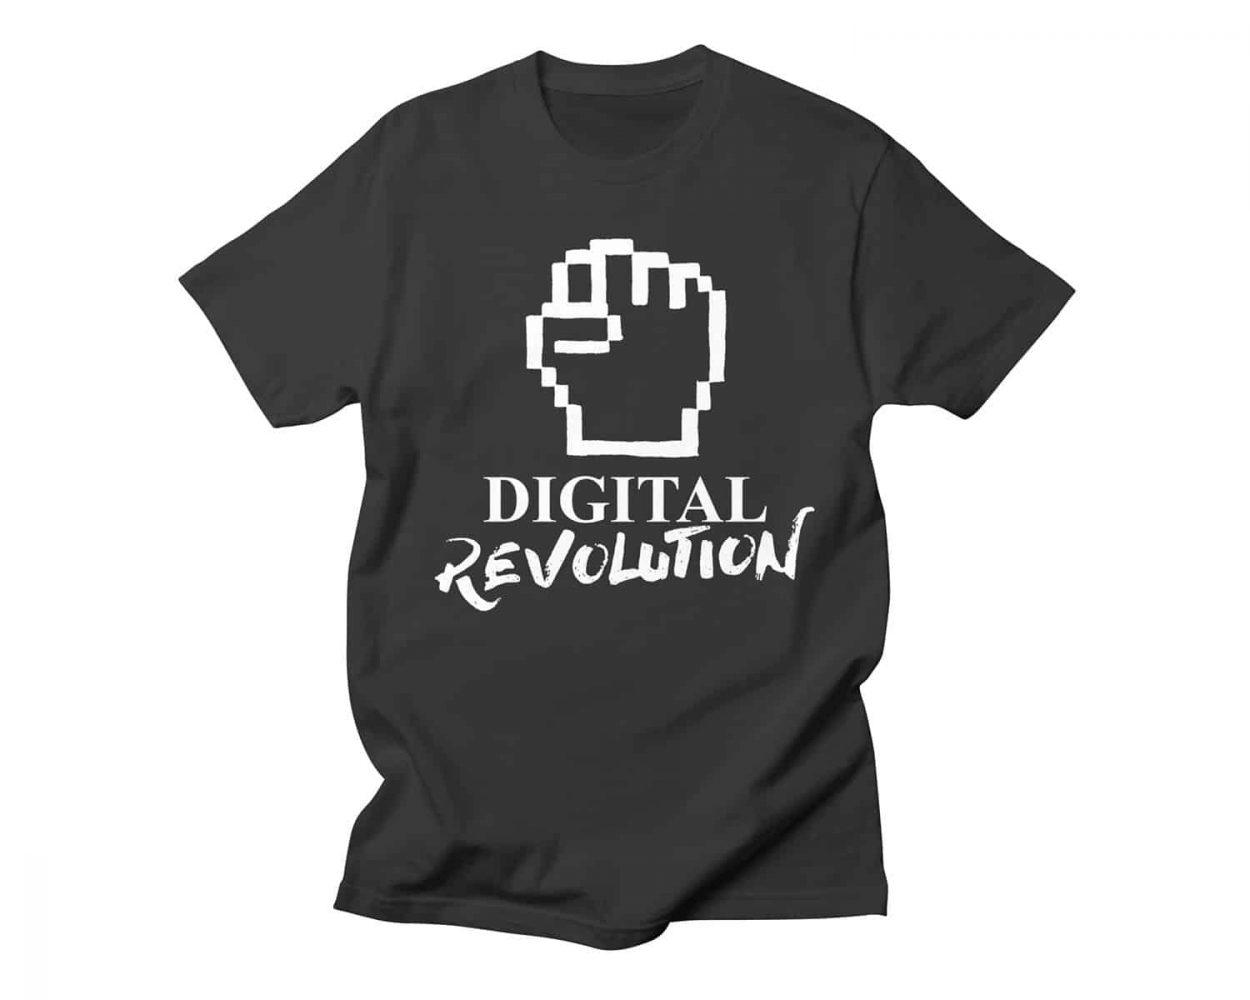 Digital Revolution Tshirt